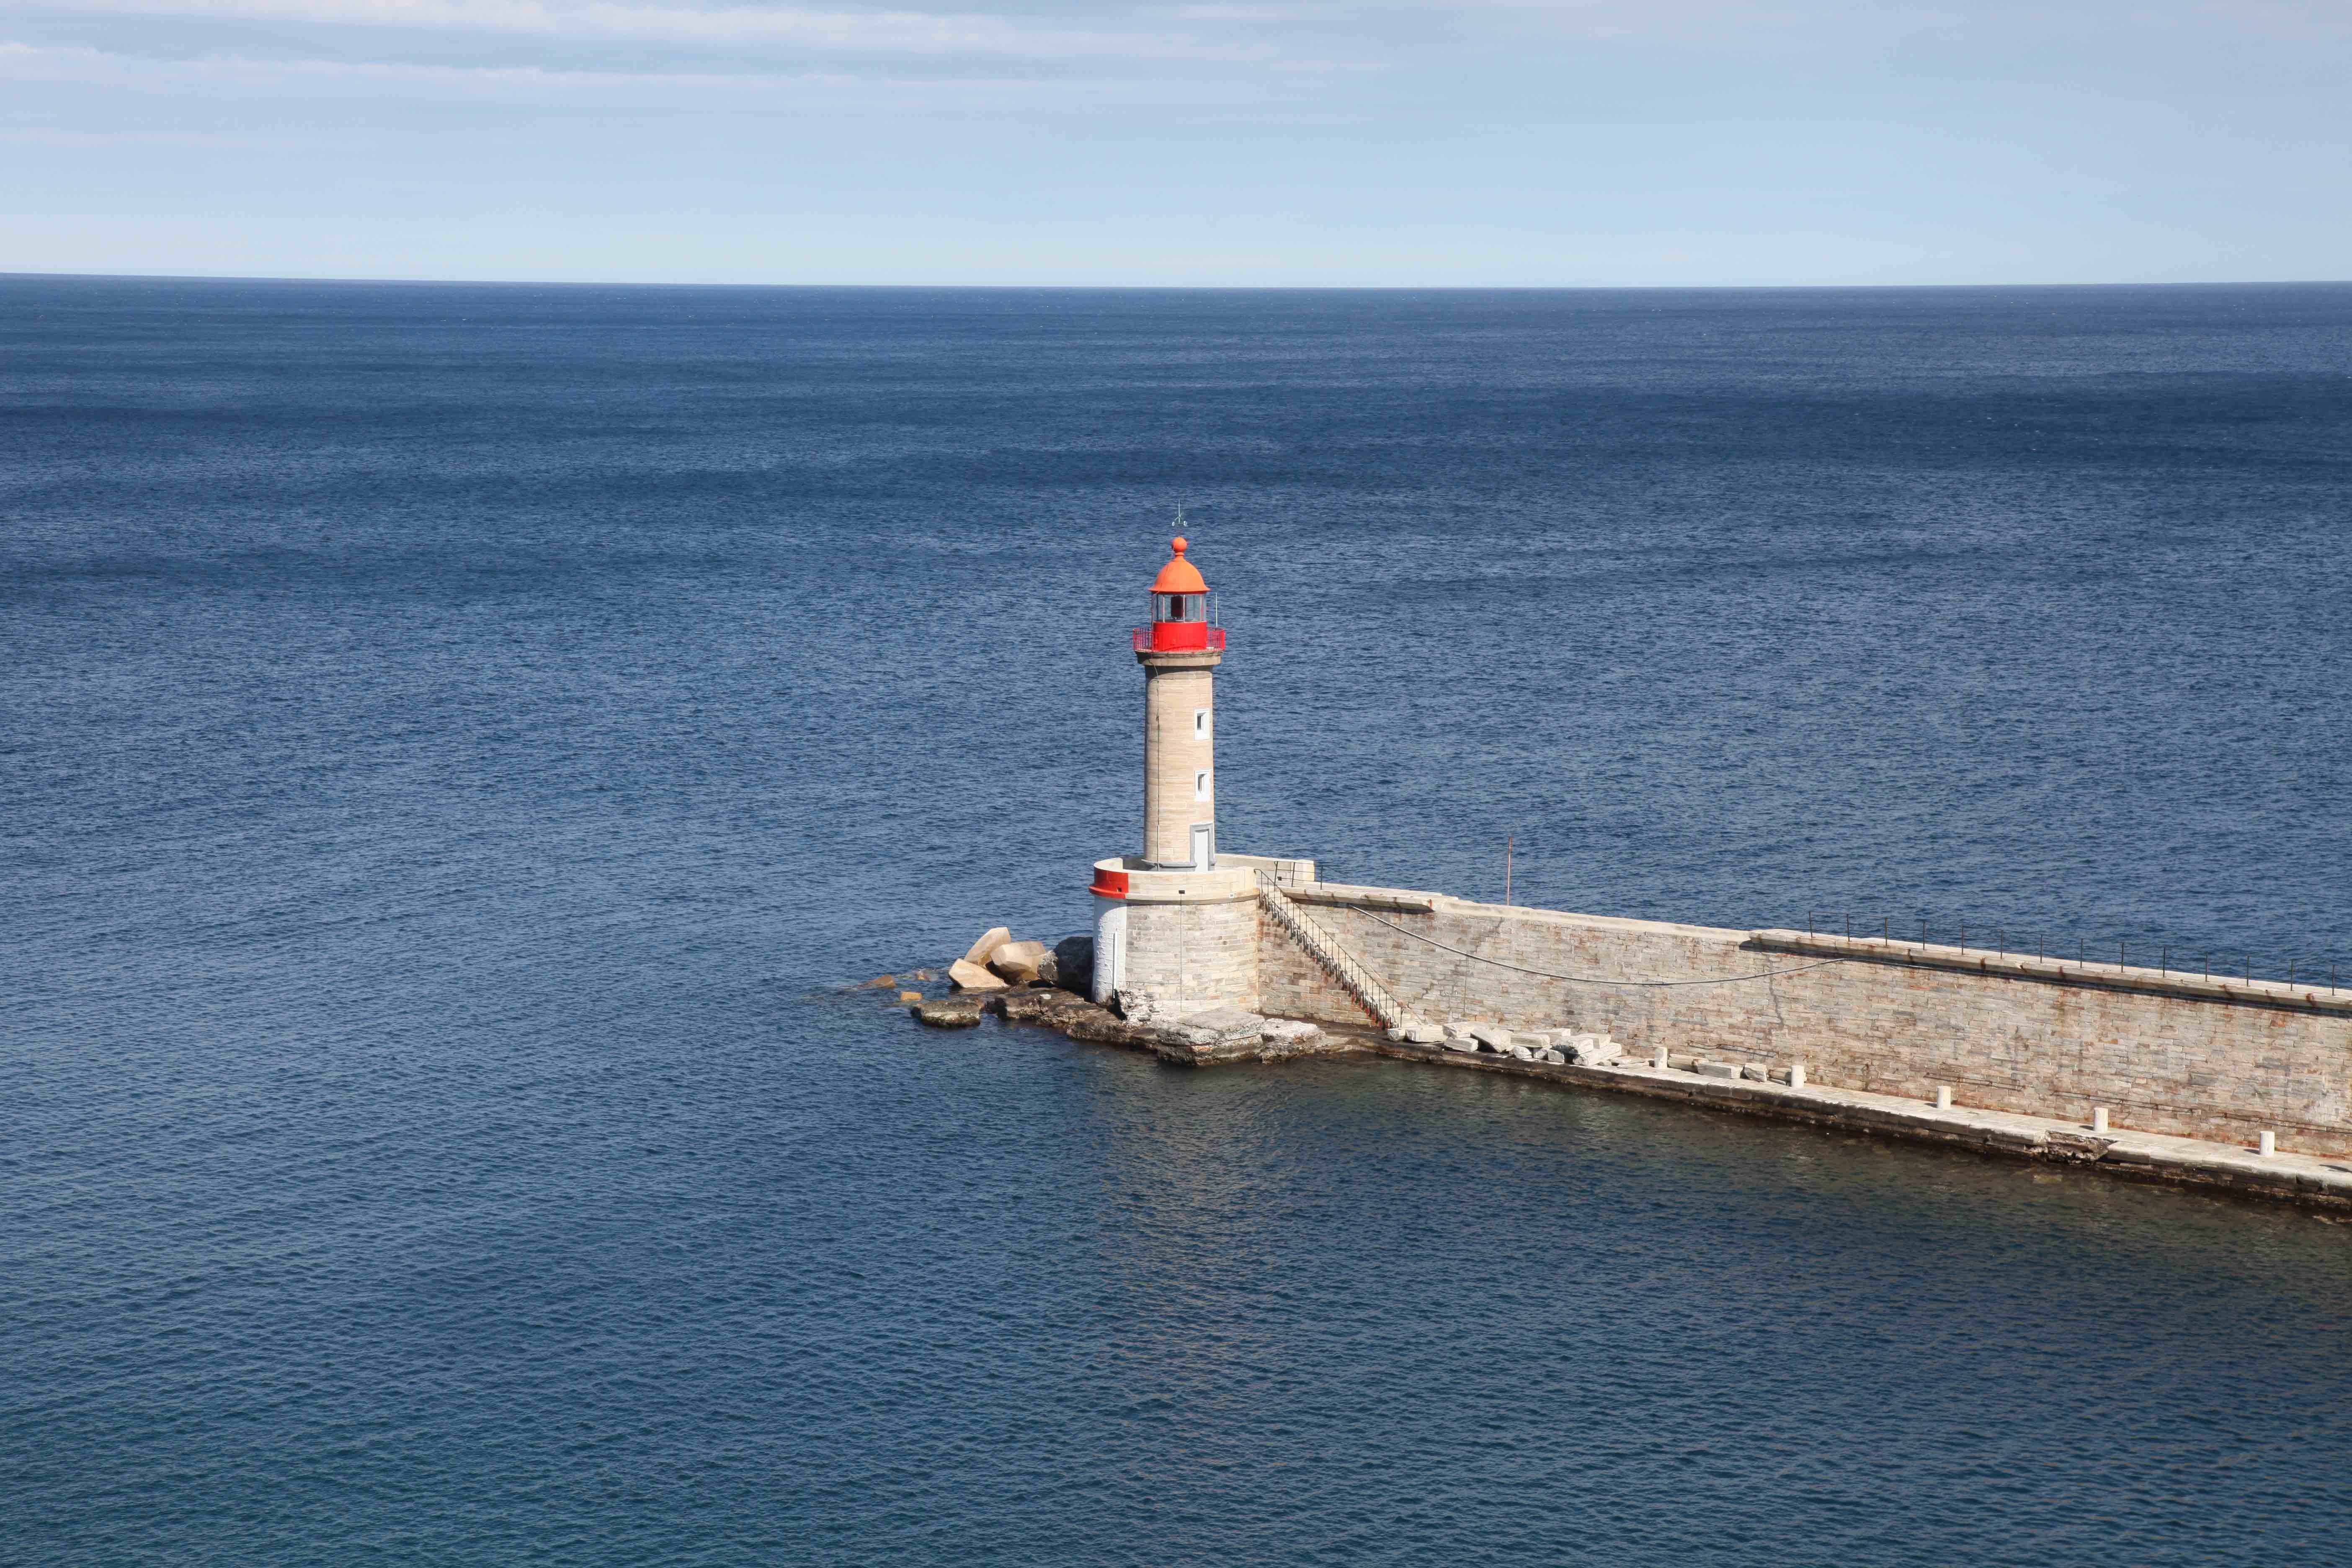 Ruhige See, Bastia, Korsika, Christian von Stosch